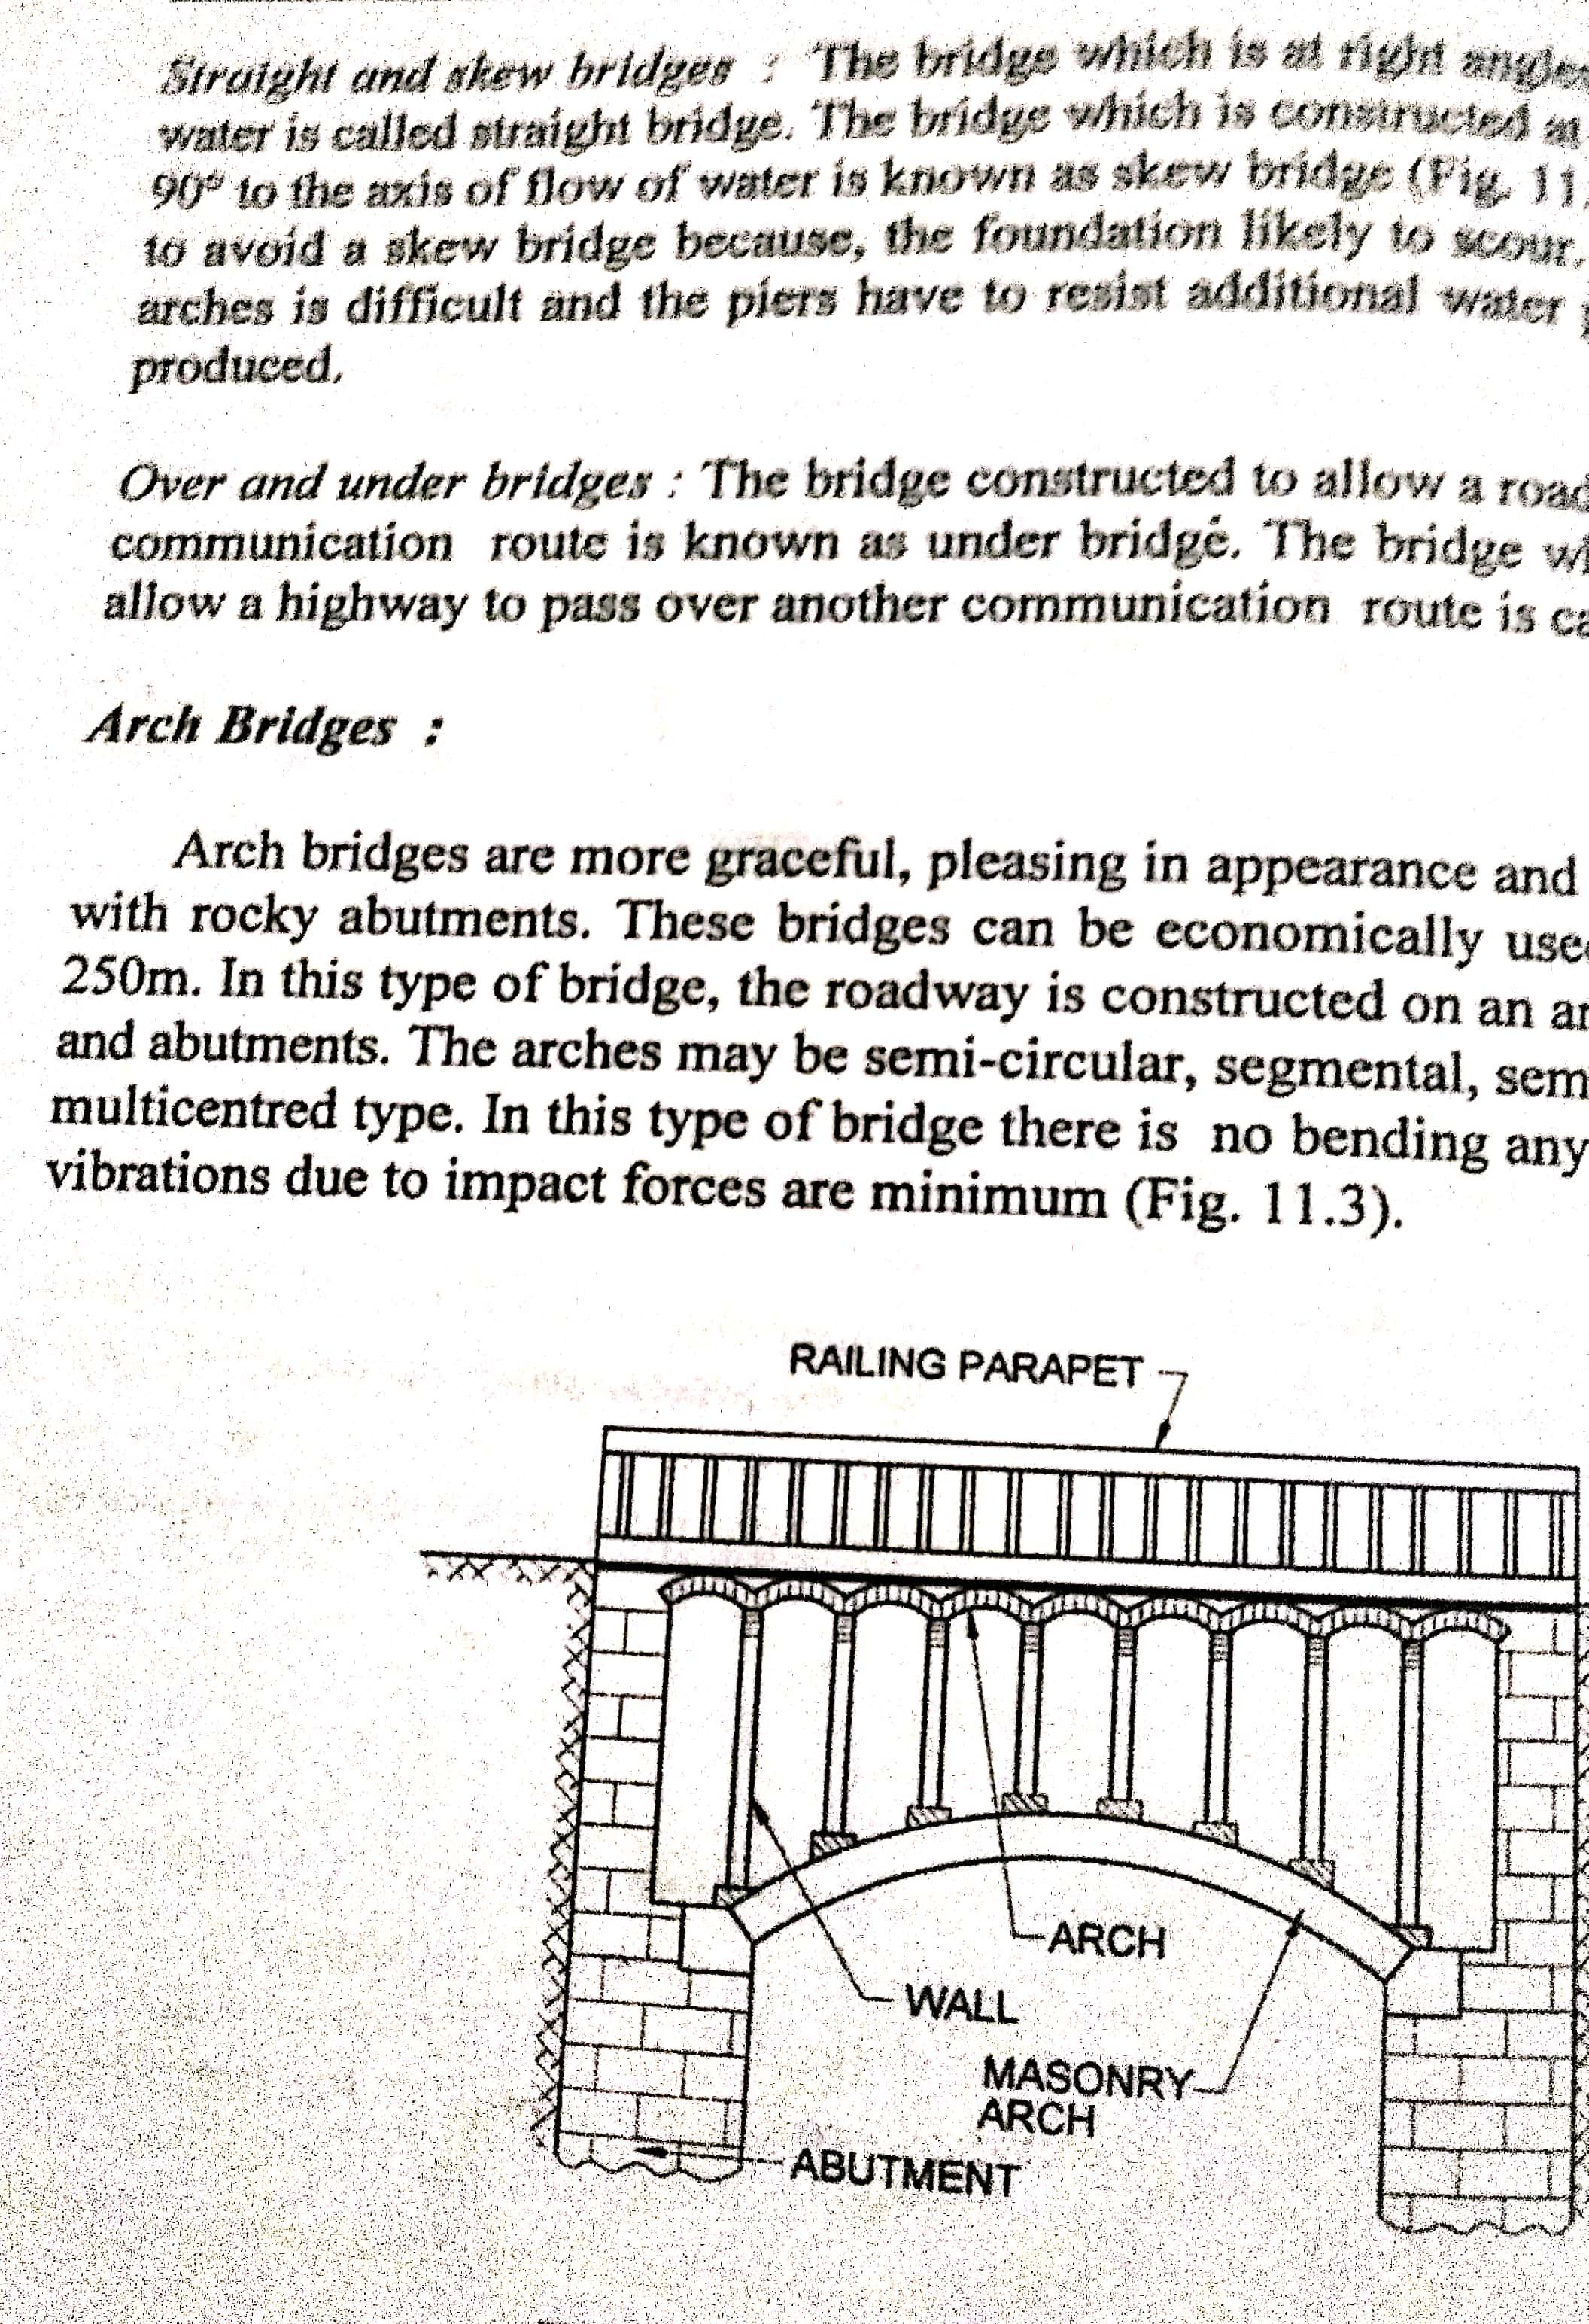 Arch Bridges  and its properties.-New Doc 2019-11-30 20.41.41_71.jpg